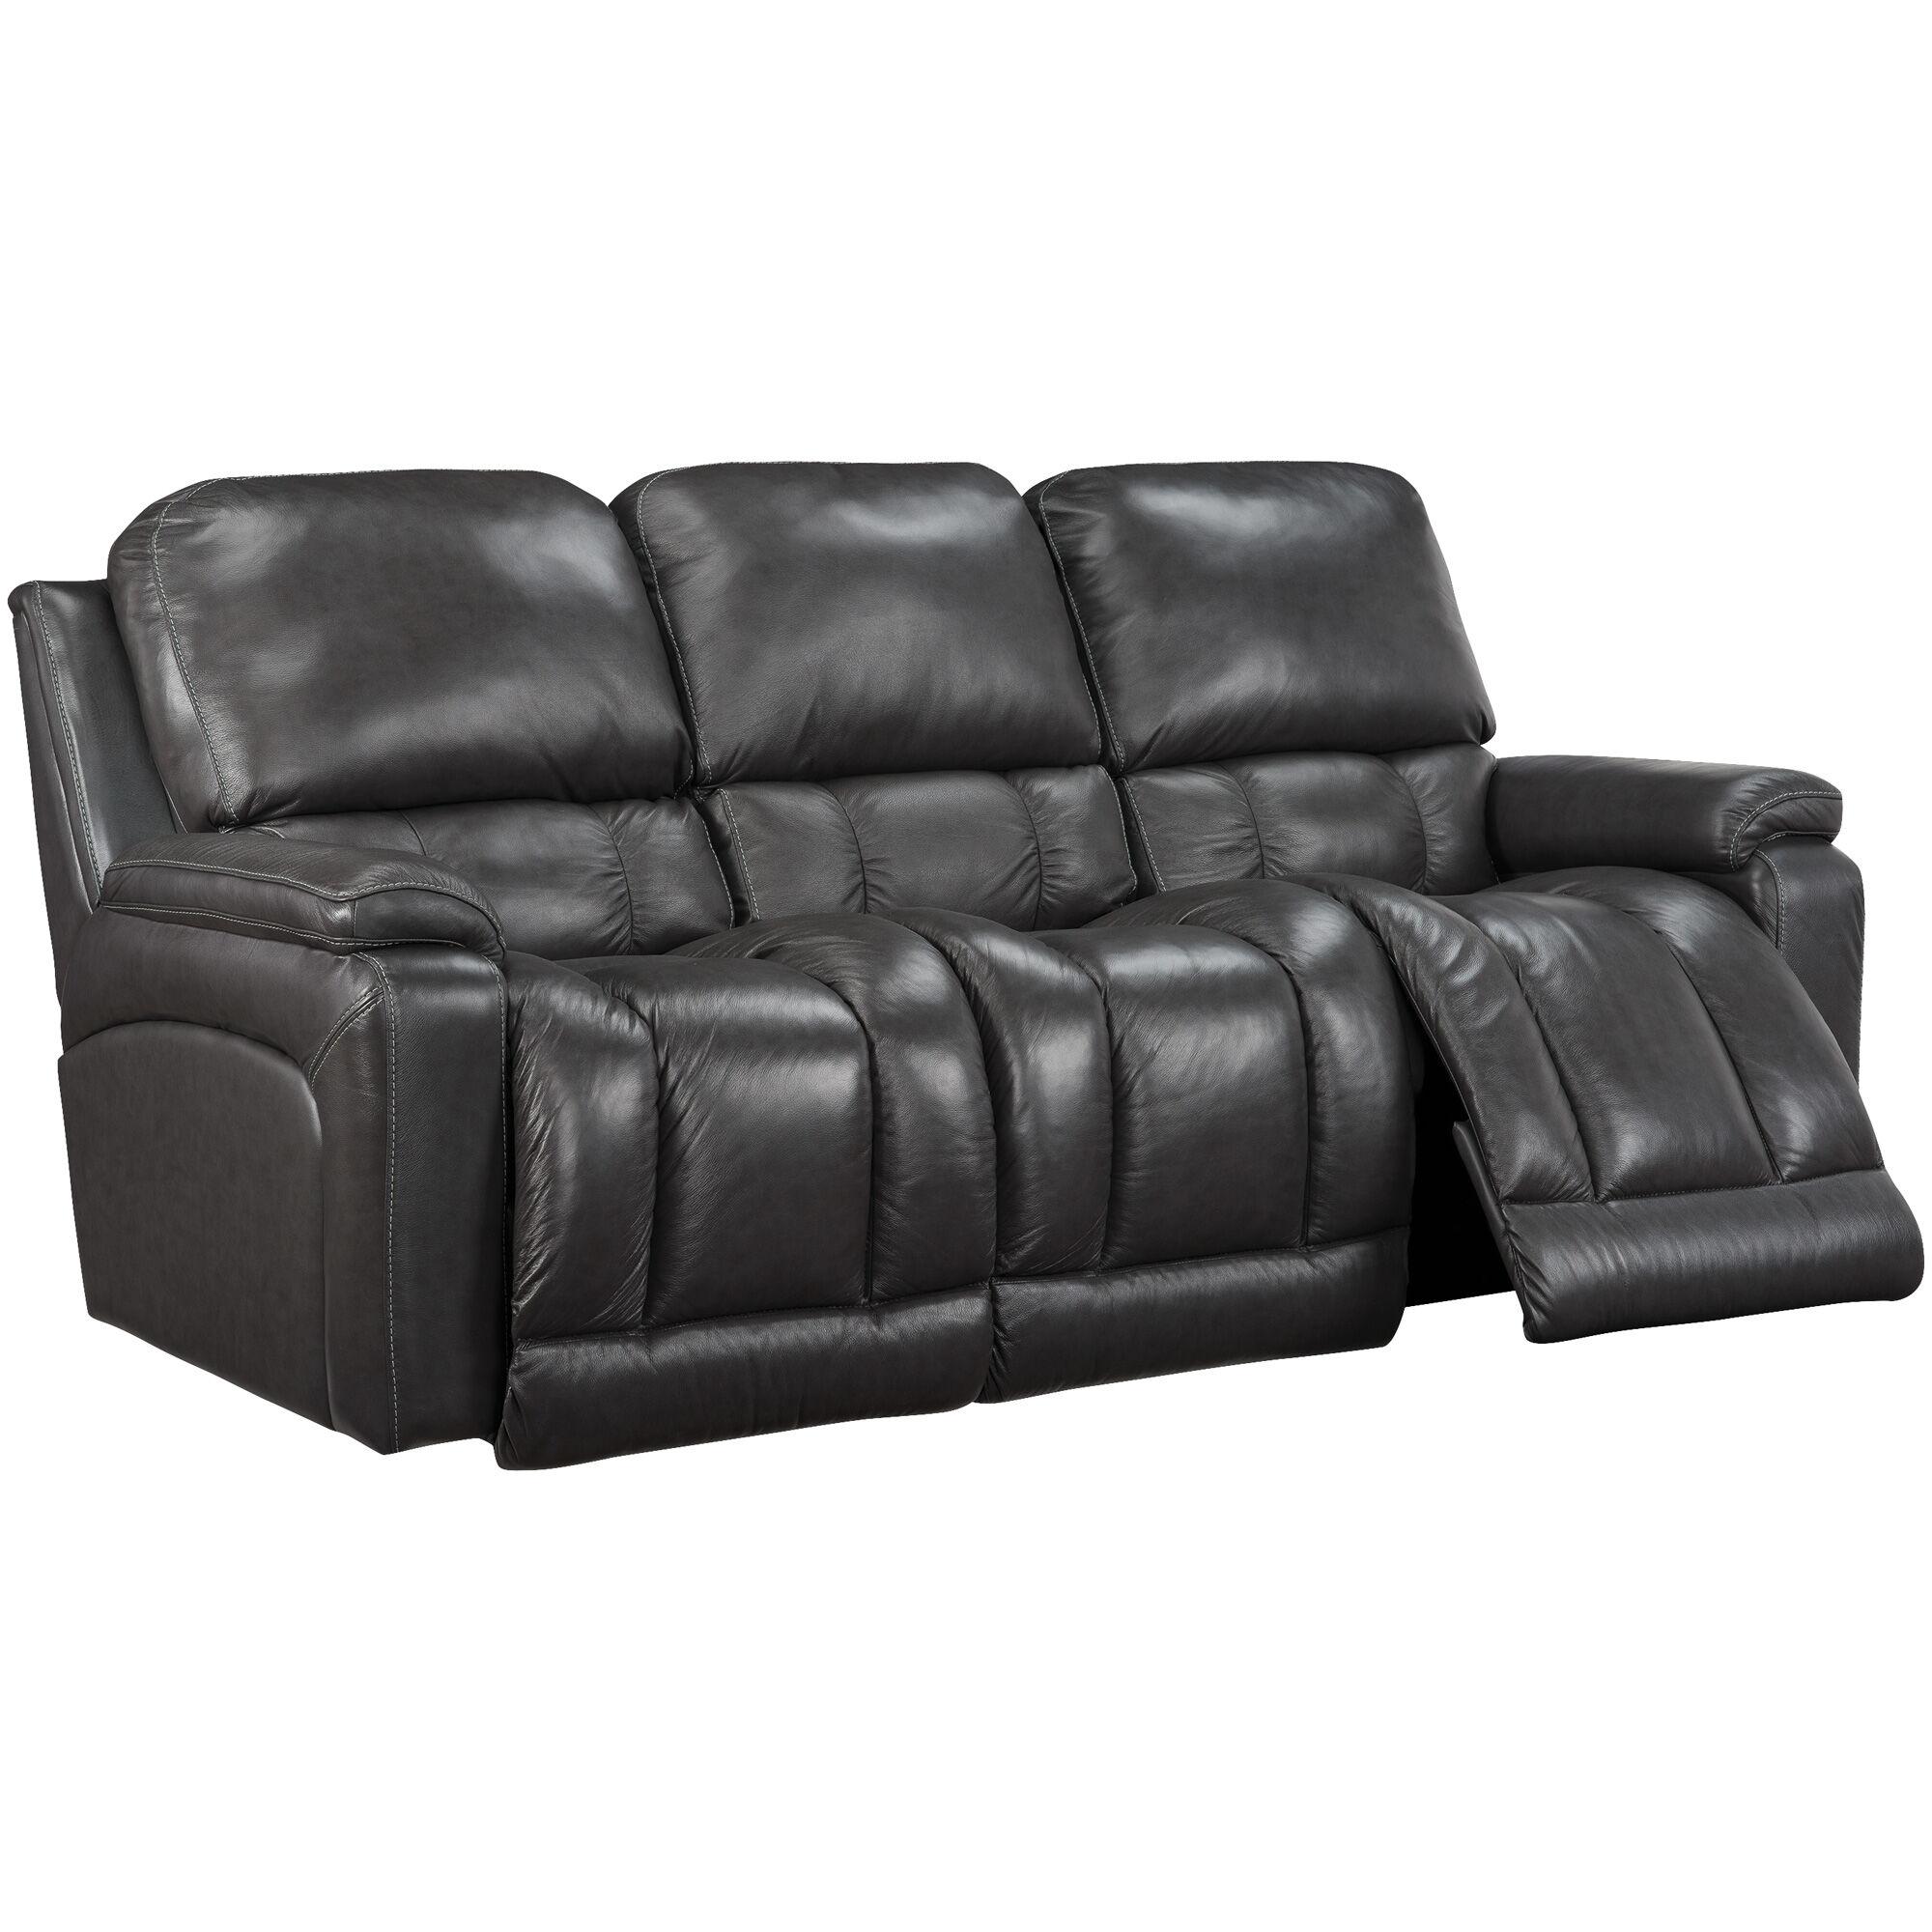 slumberland sofa recliners bizzarto palermo lazy boy greyson leather reclining home the honoroak